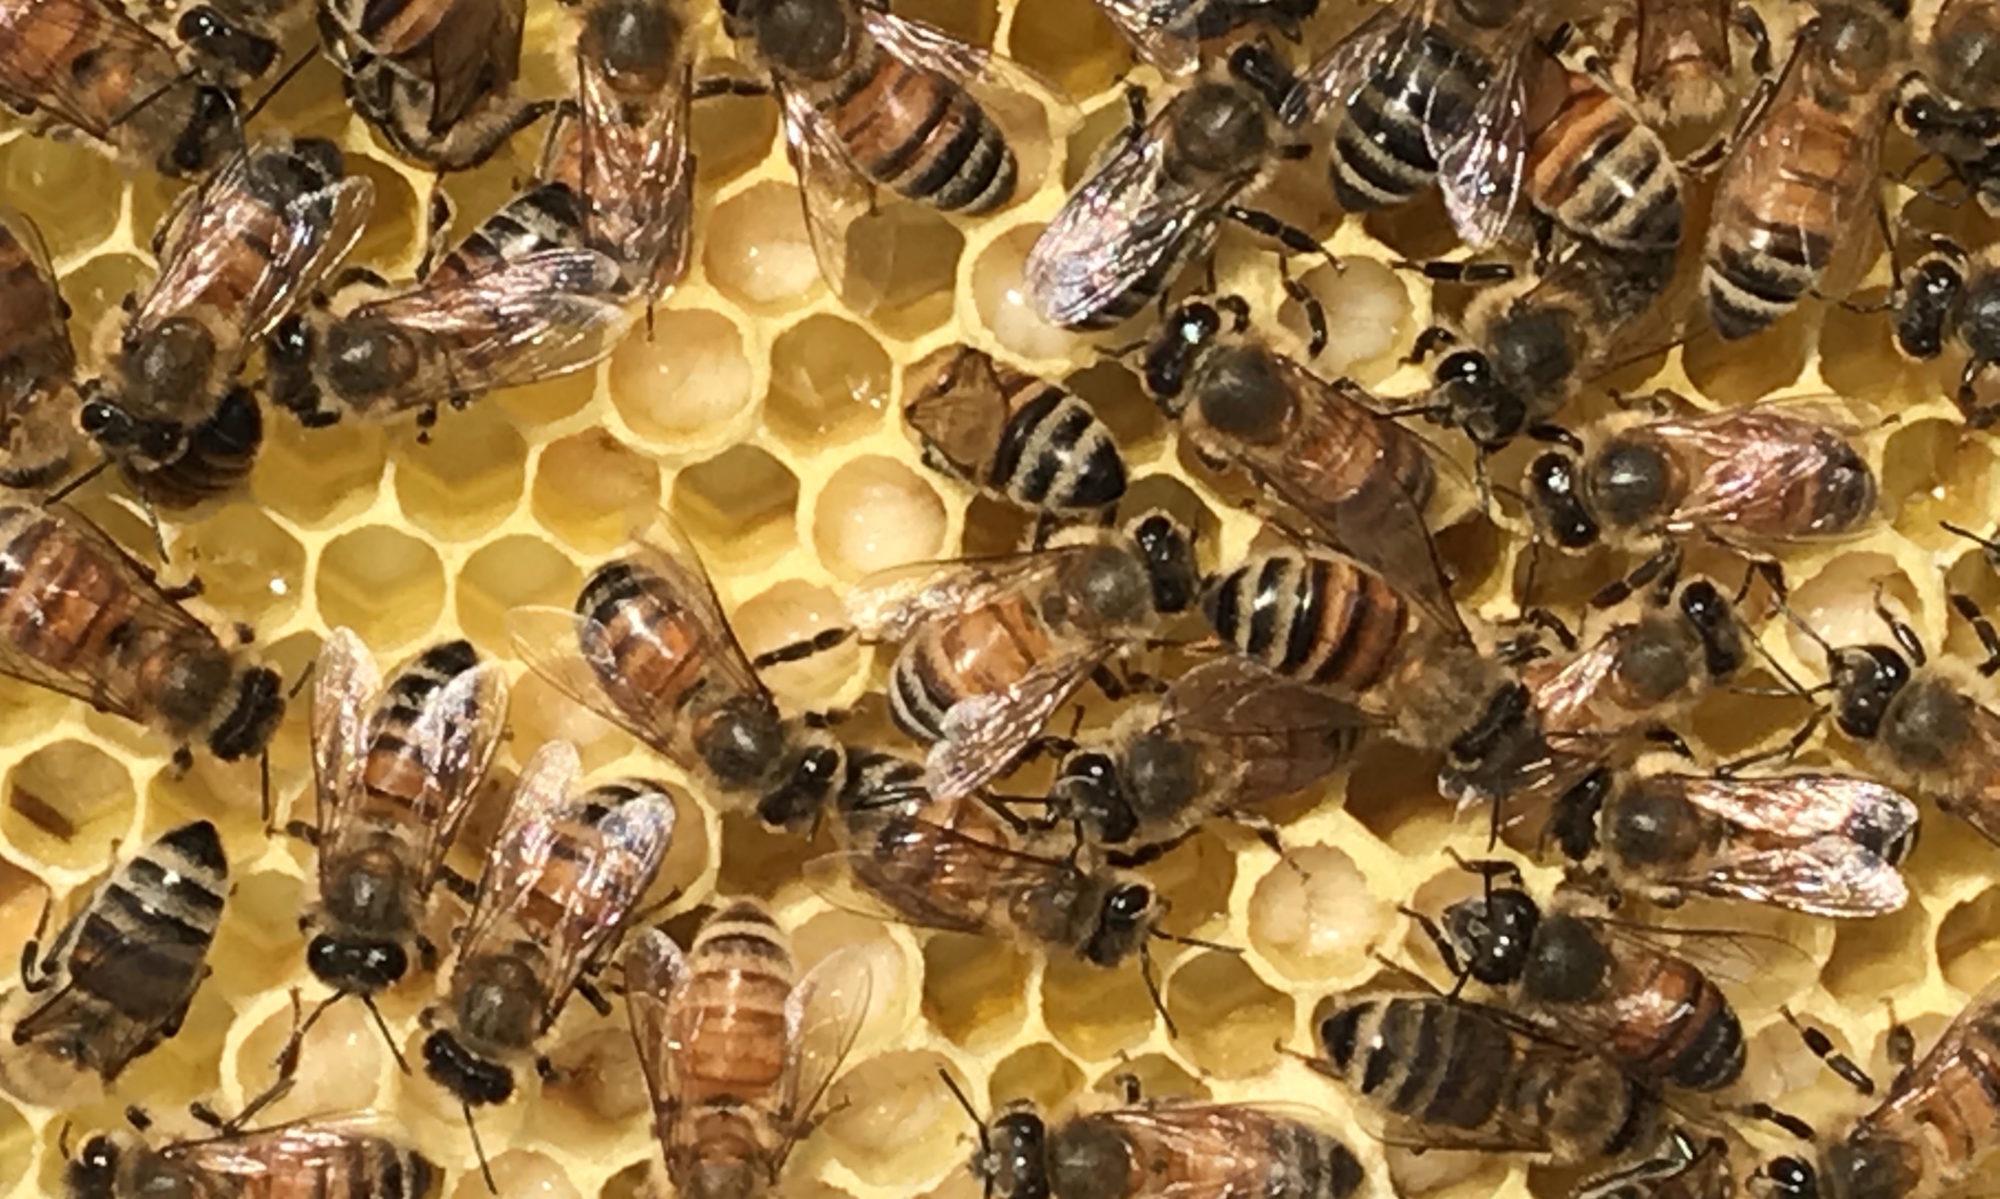 Baltimore Beekeepers